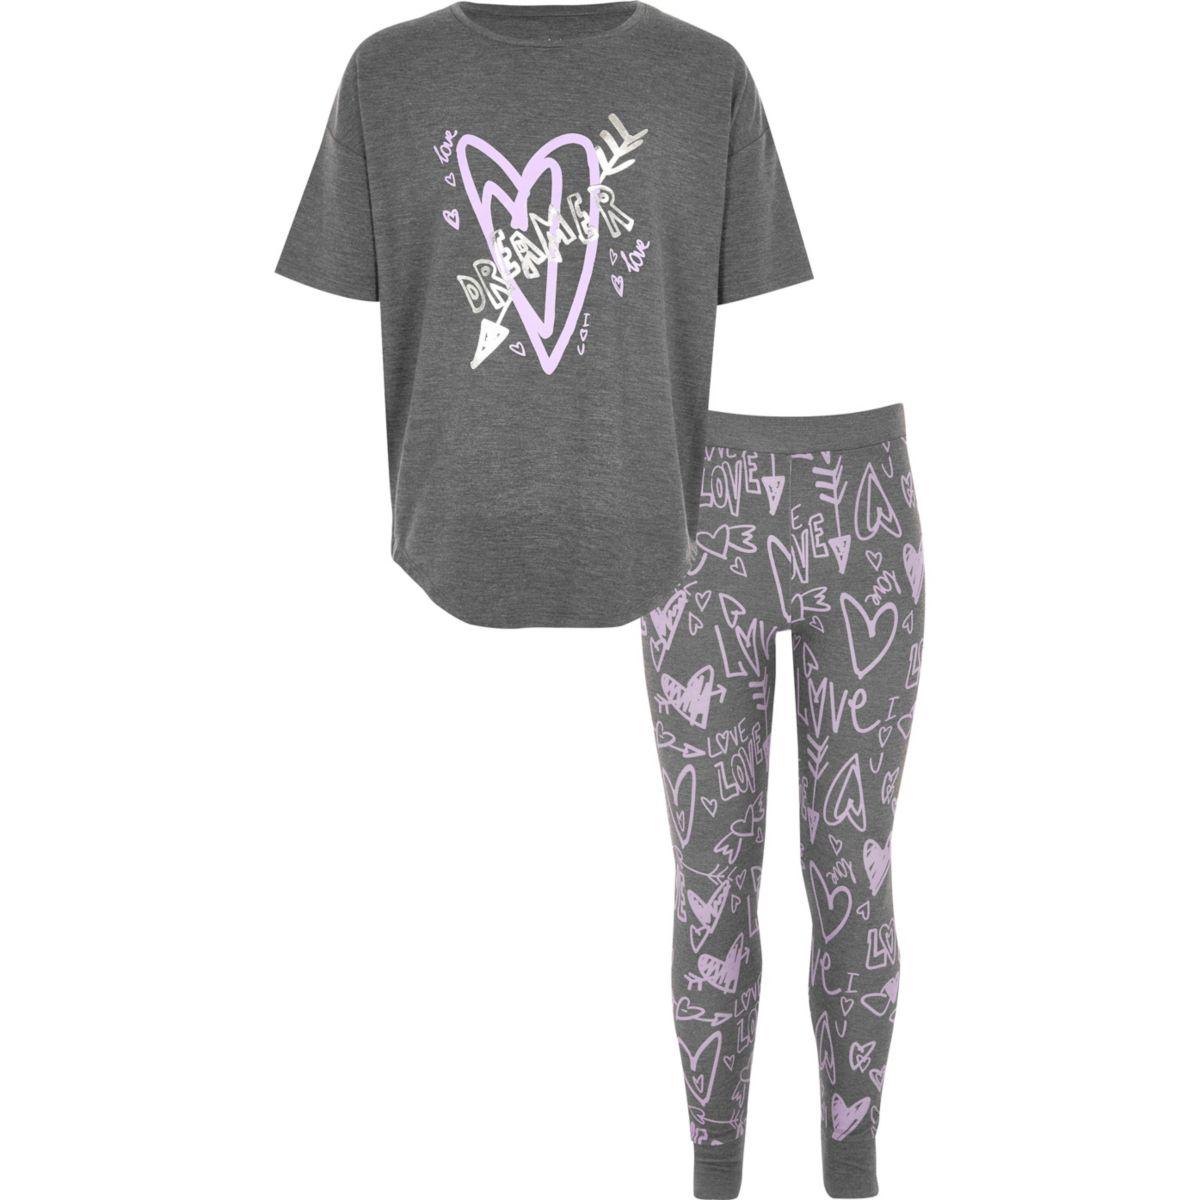 Pyjama gris à imprimé graffiti pour fille